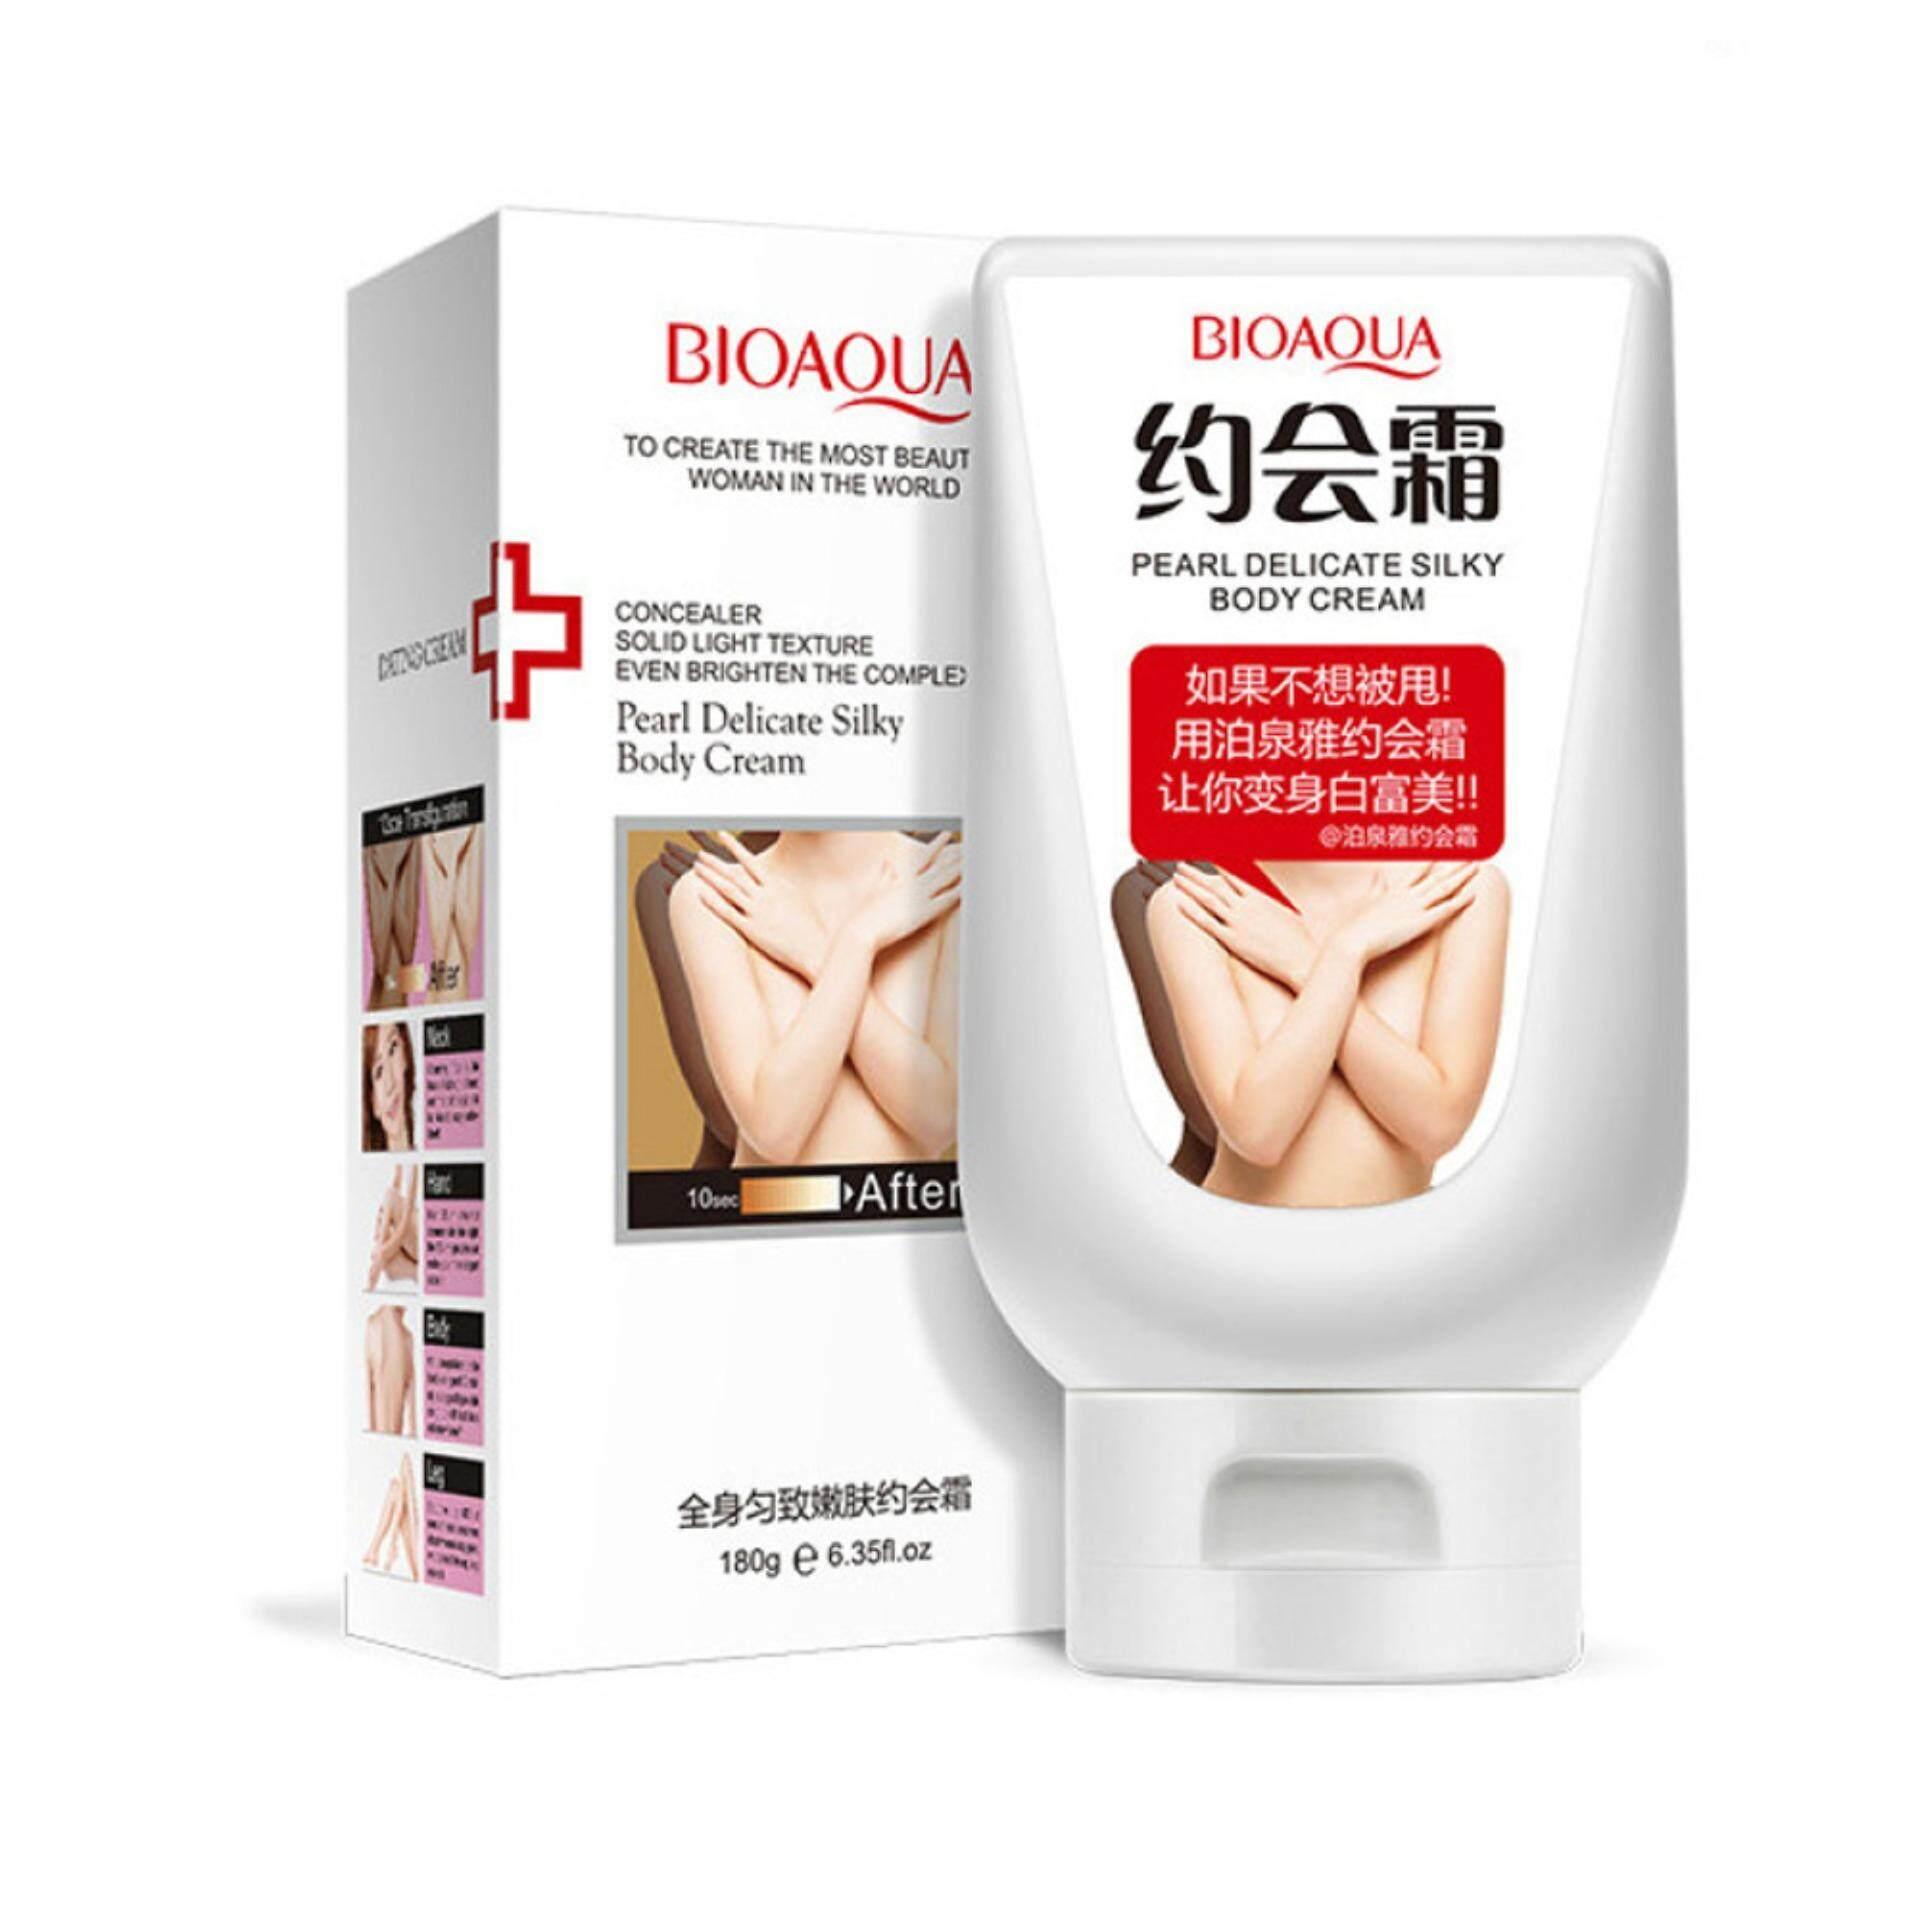 Fitur Ertos Body Cream Whitening Lotion Krim Pemutih Badan Skincare Bpom Original Bioaqua Pearl Delicate Silky 180g Bqy2362